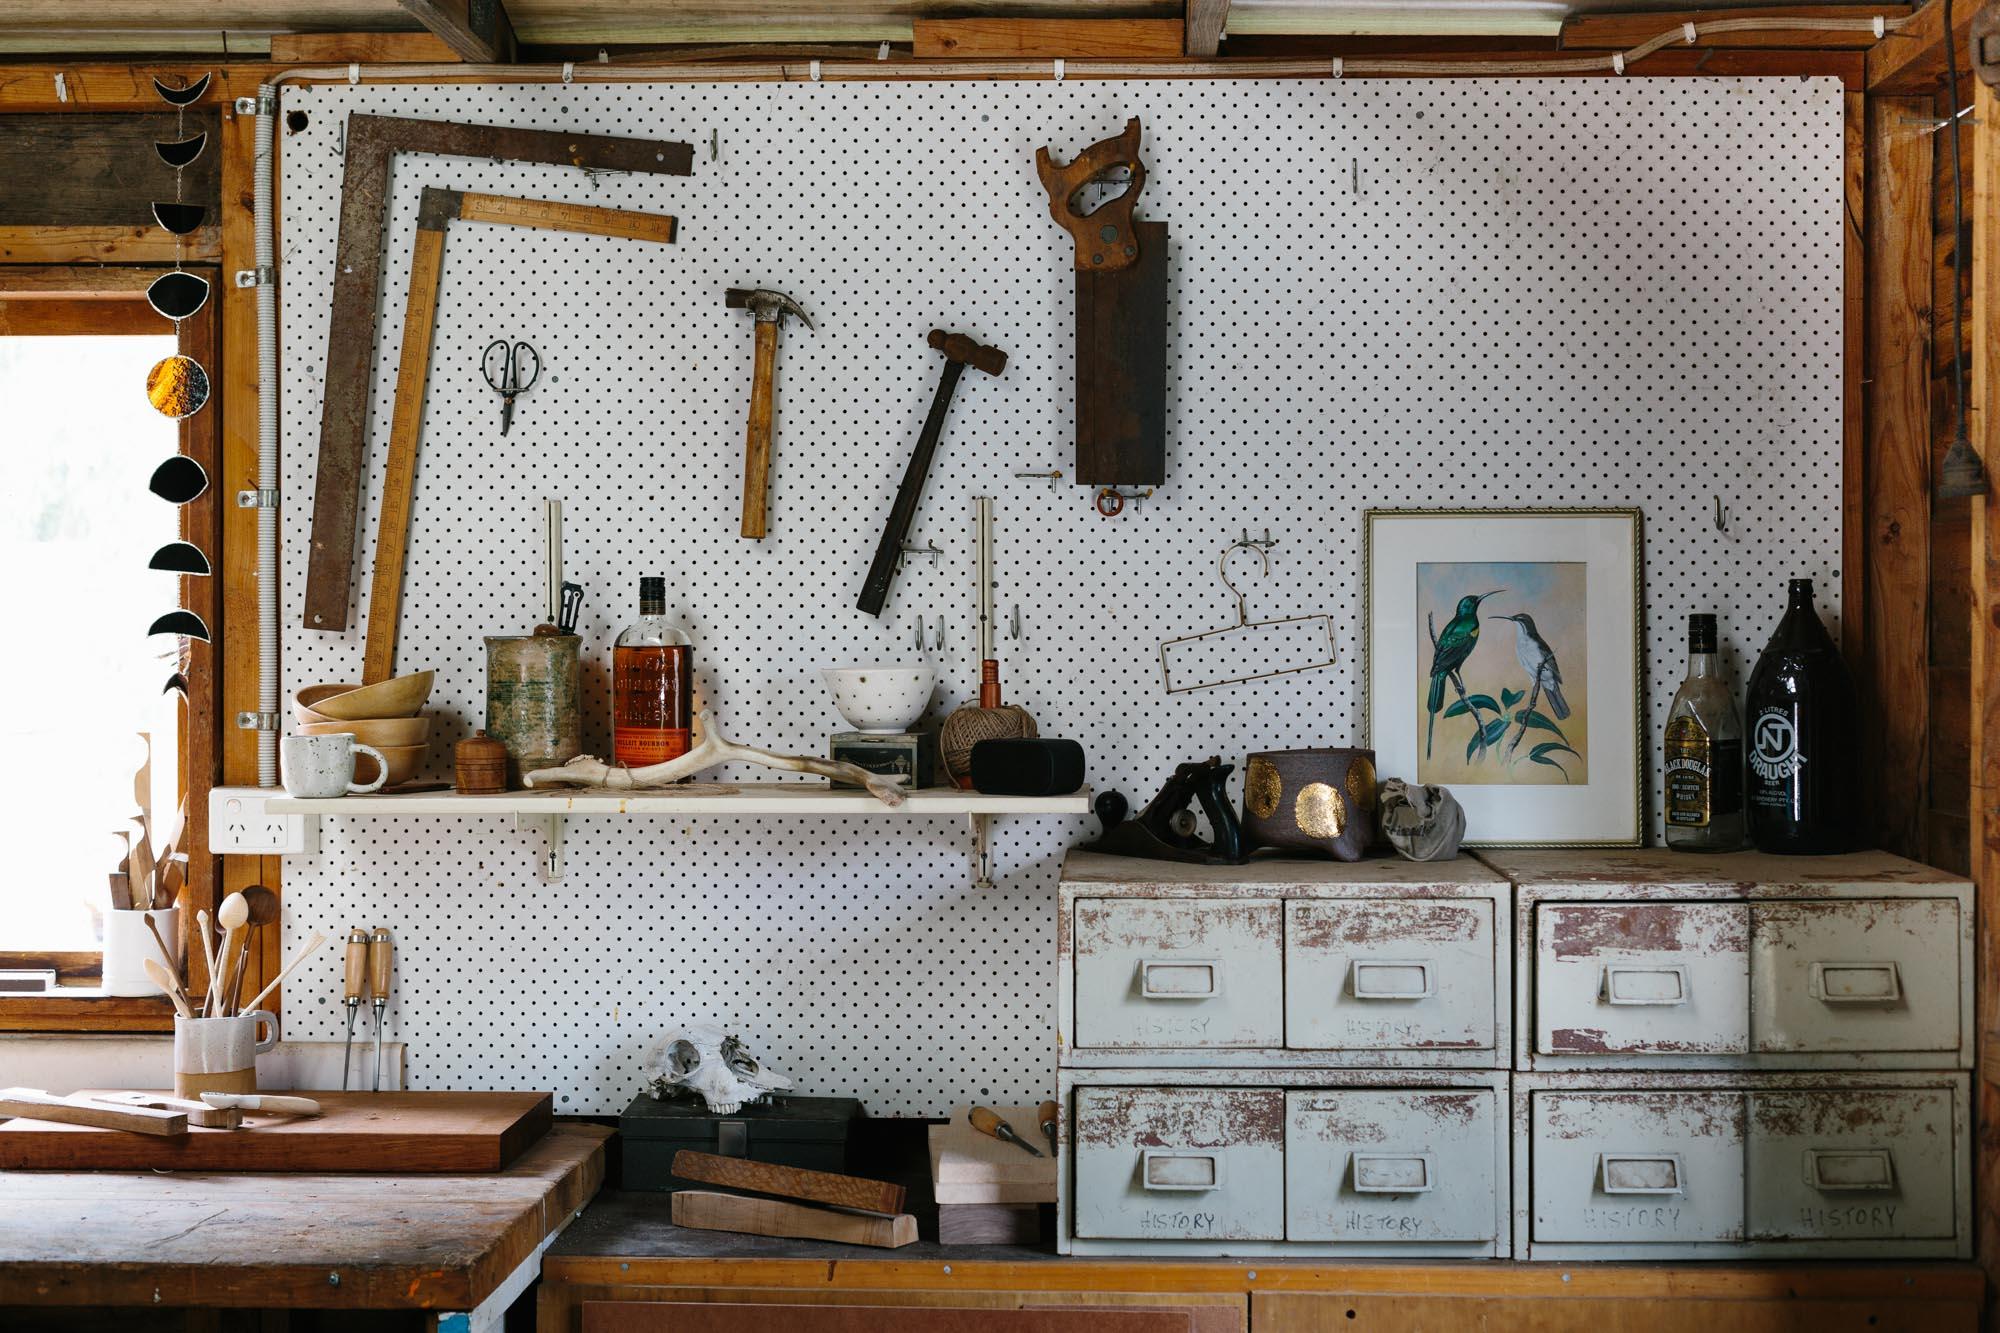 Erin+Malloy+Woodworker_Melbourne+australia+creative+for+the+design+files